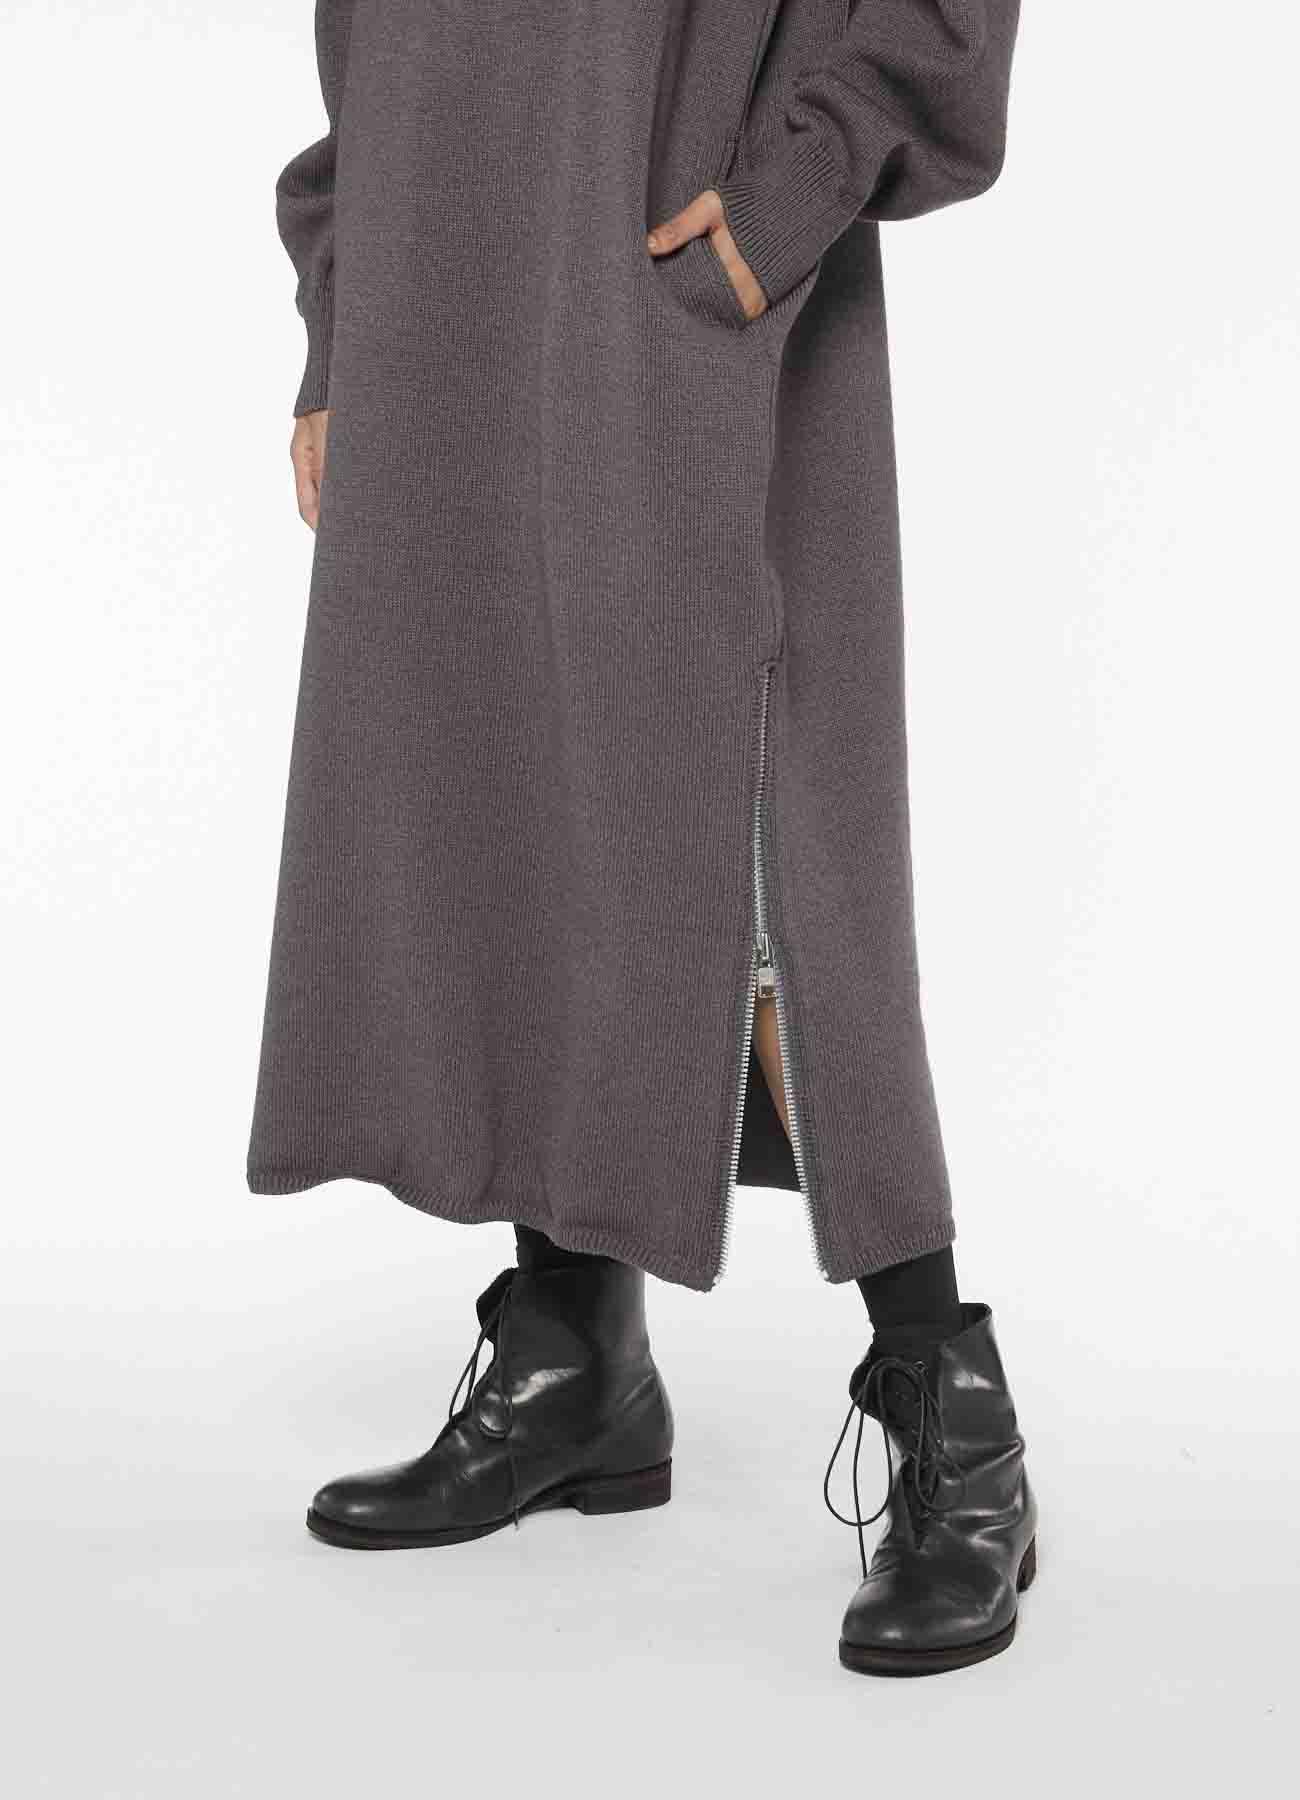 RISMATbyY's POLYESTER WOOL ZIP DRESS